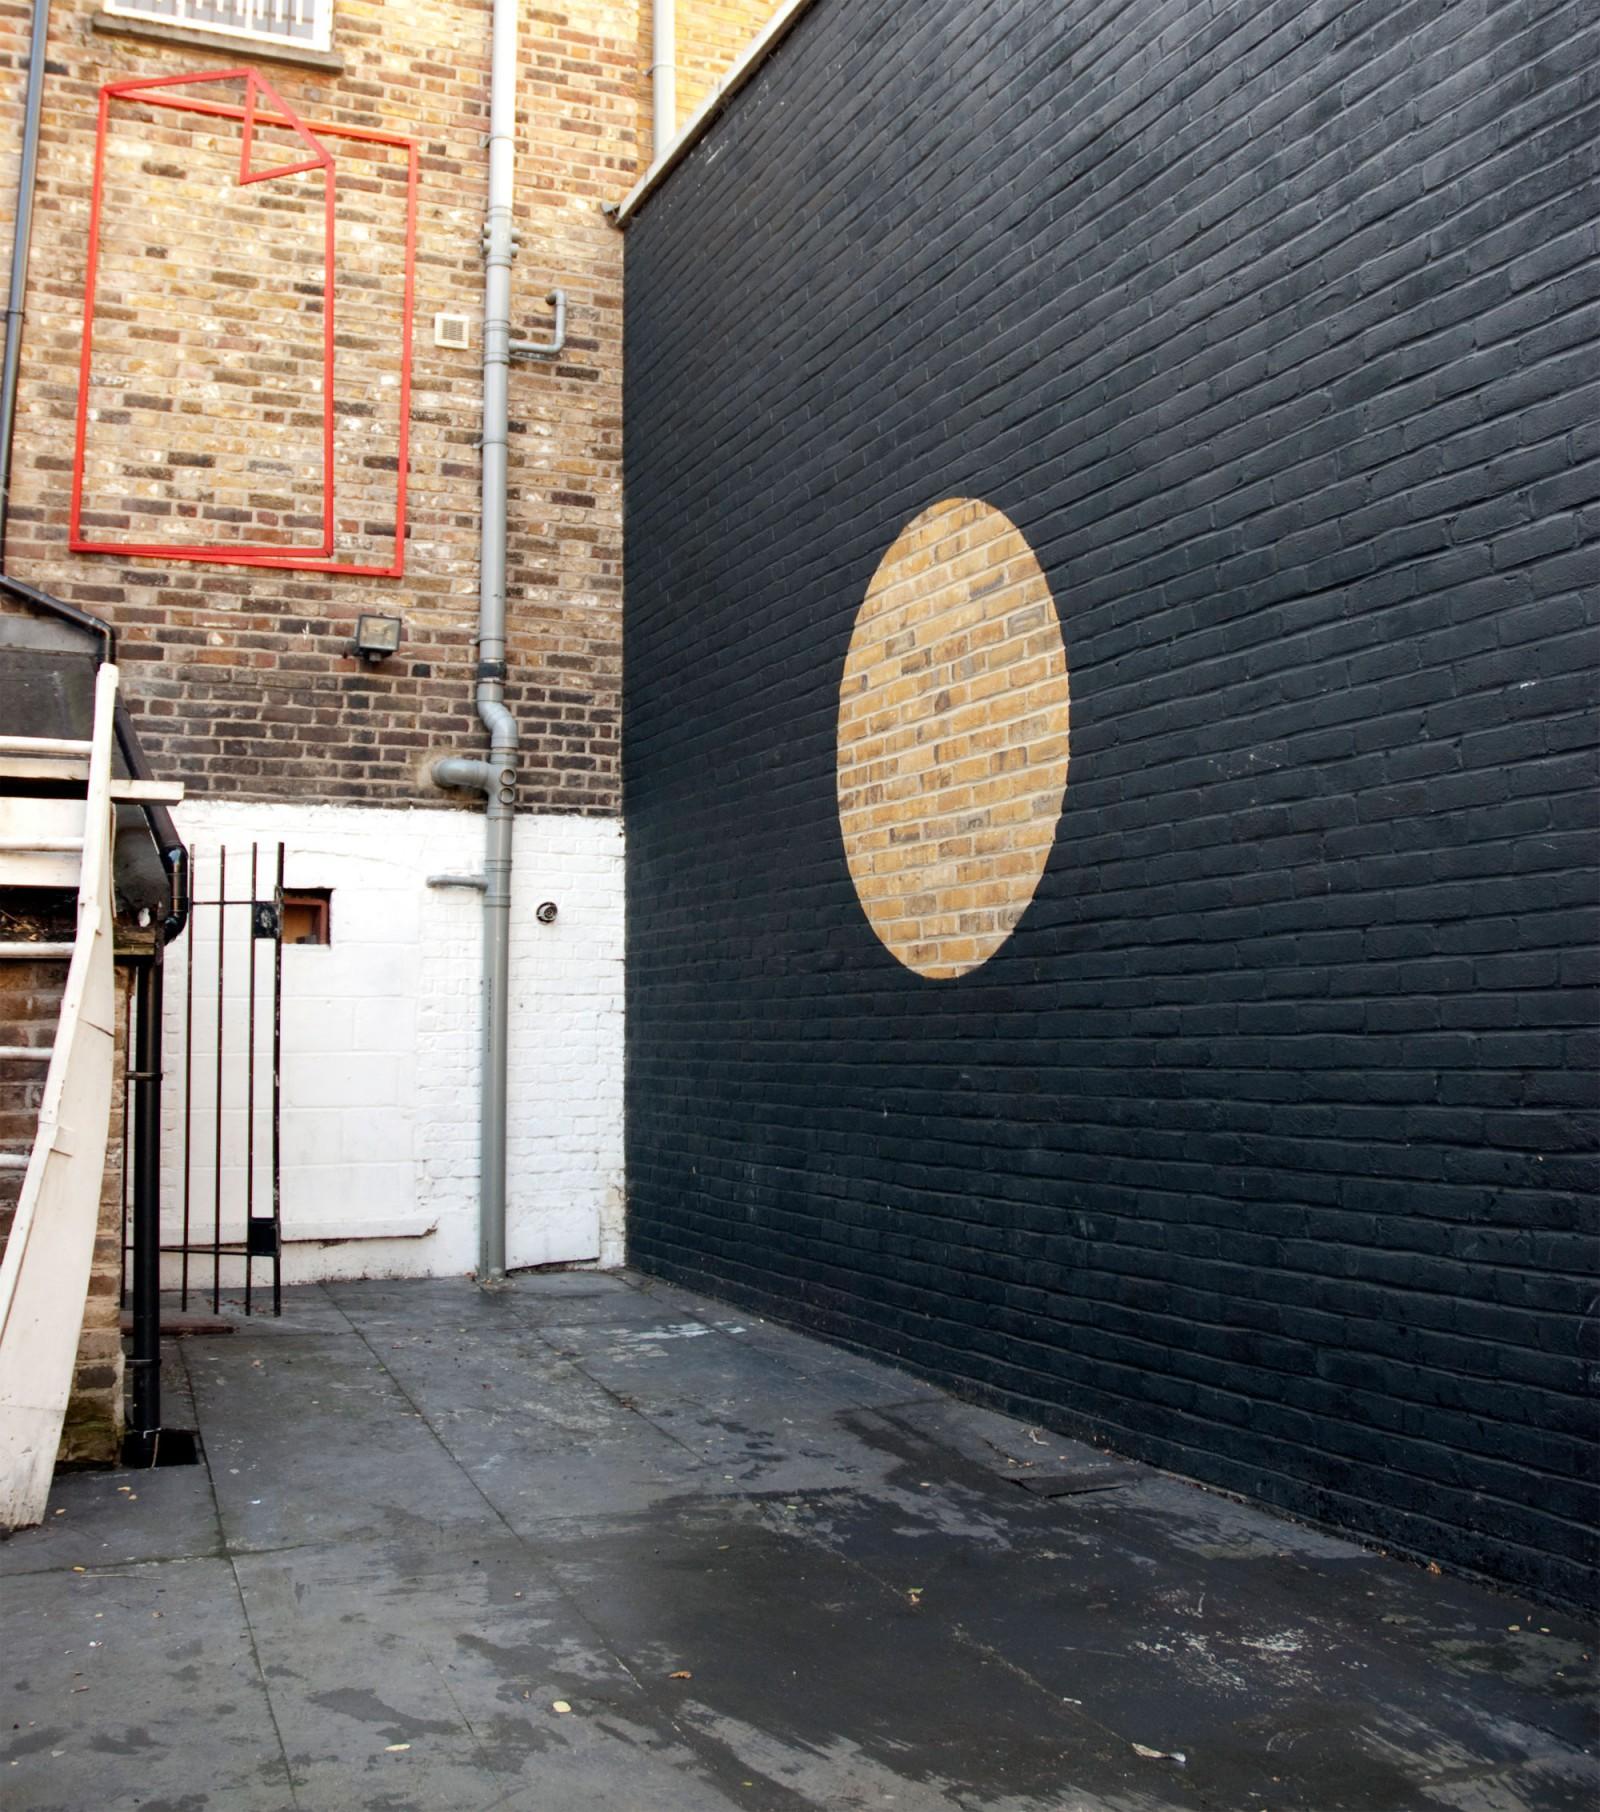 Kim Nekarda: Untitled, 2004, Wall Painting, Universal Outstrech, Flaca, London, 500 x 700 cm